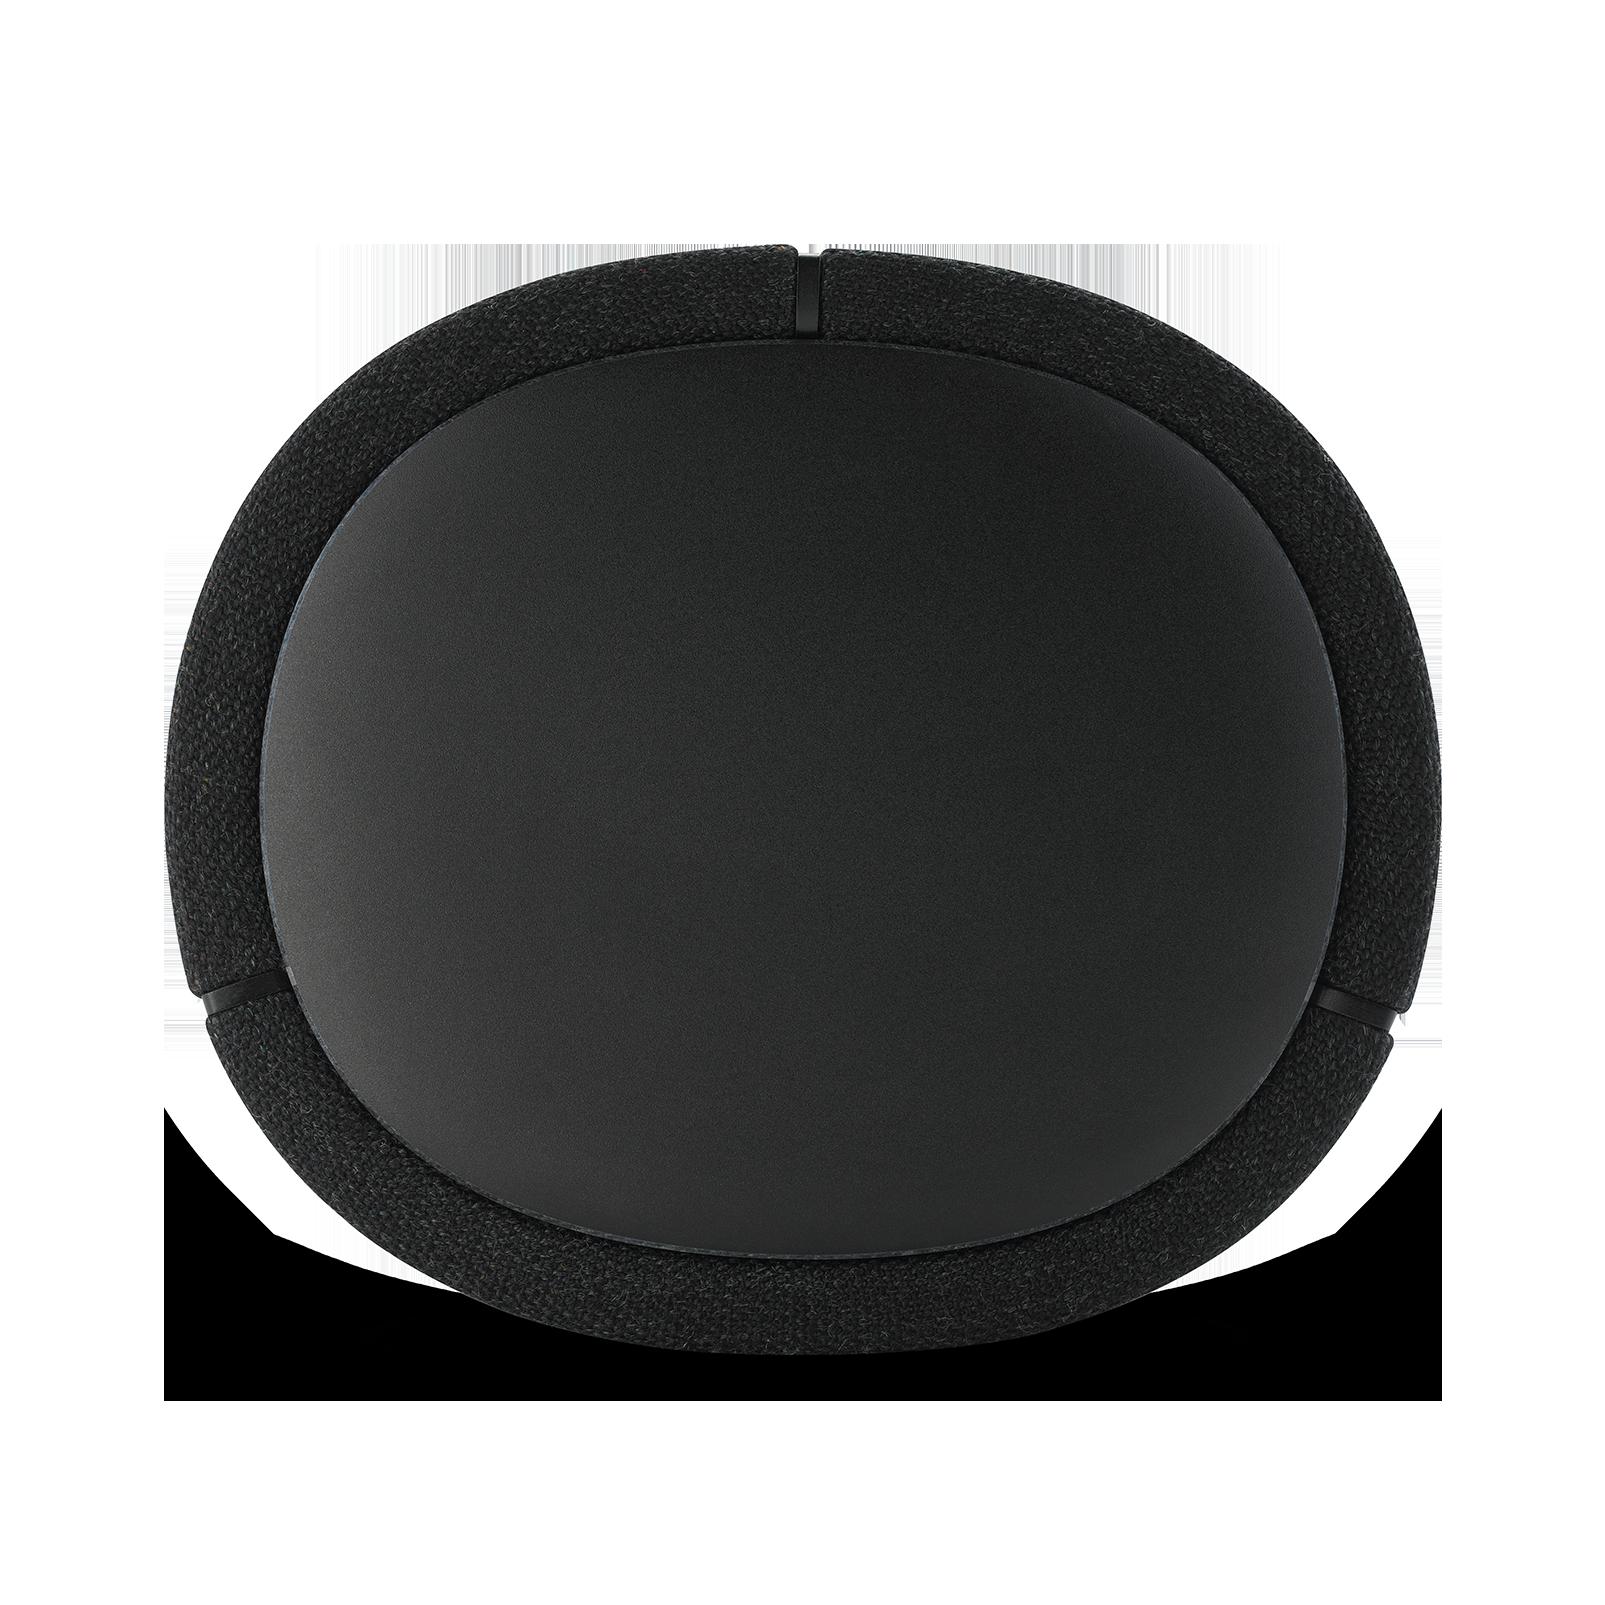 Harman Kardon Citation Tower - Black - Smart Premium Floorstanding Speaker that delivers an impactful performance - Detailshot 3